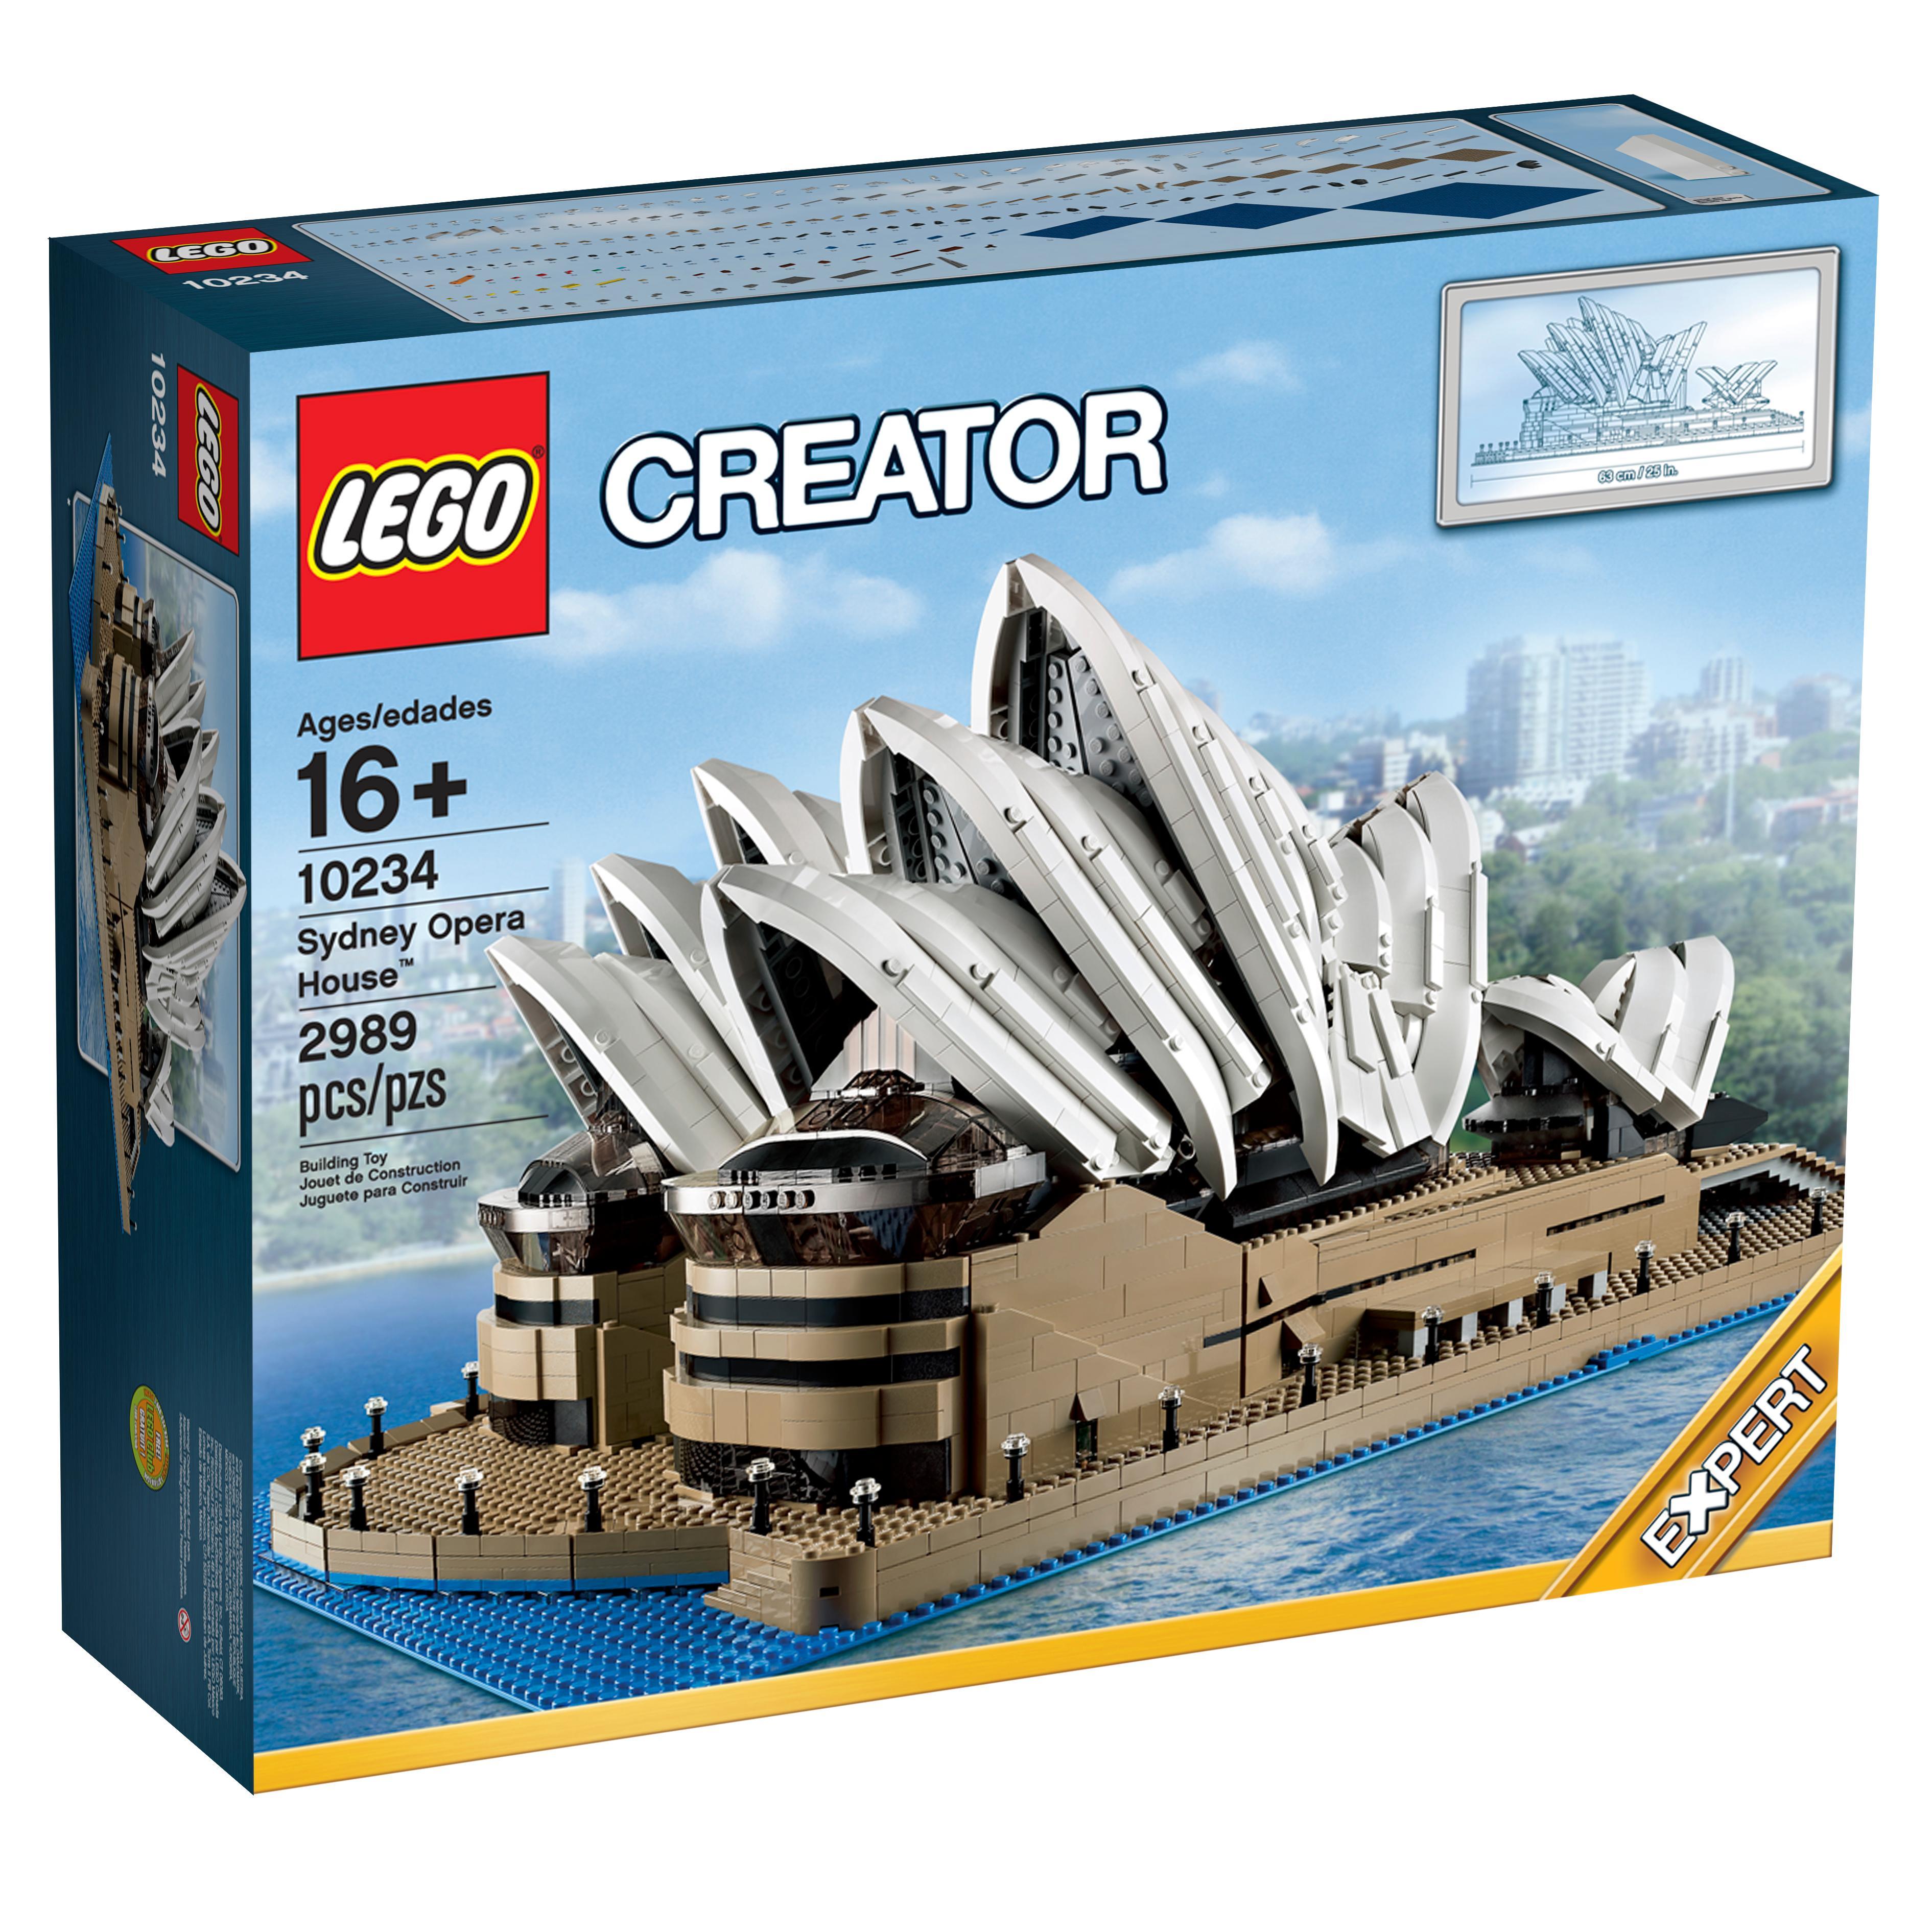 lego creator expert 10234 sydney opera house. Black Bedroom Furniture Sets. Home Design Ideas